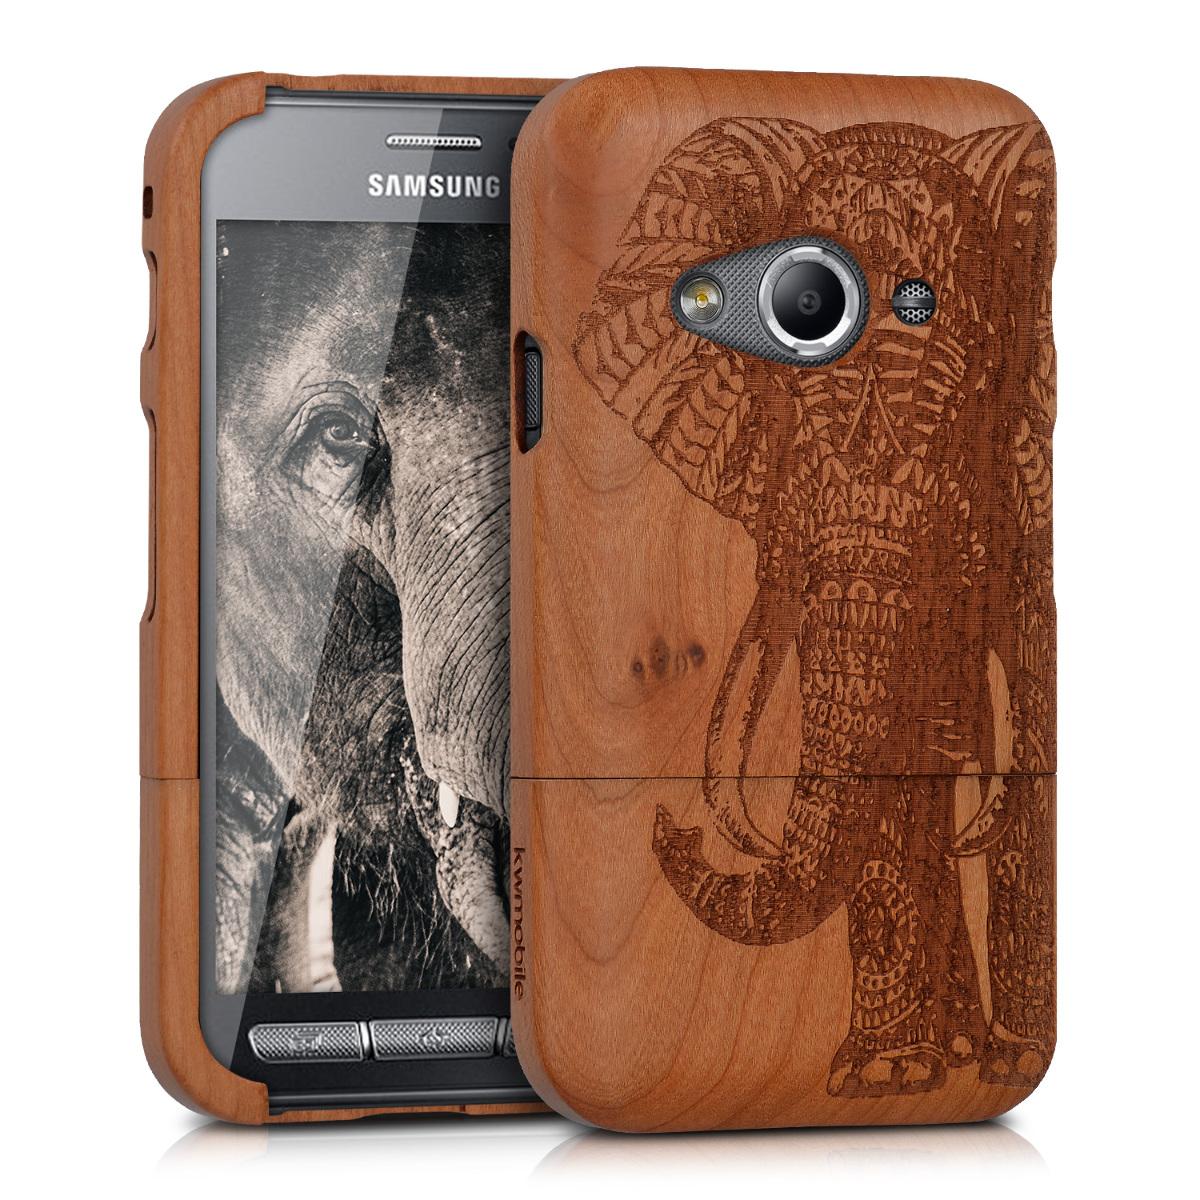 KW Ξύλινη Θήκη Samsung Galaxy Xcover 3 - Elephant - Brown (39482.01)